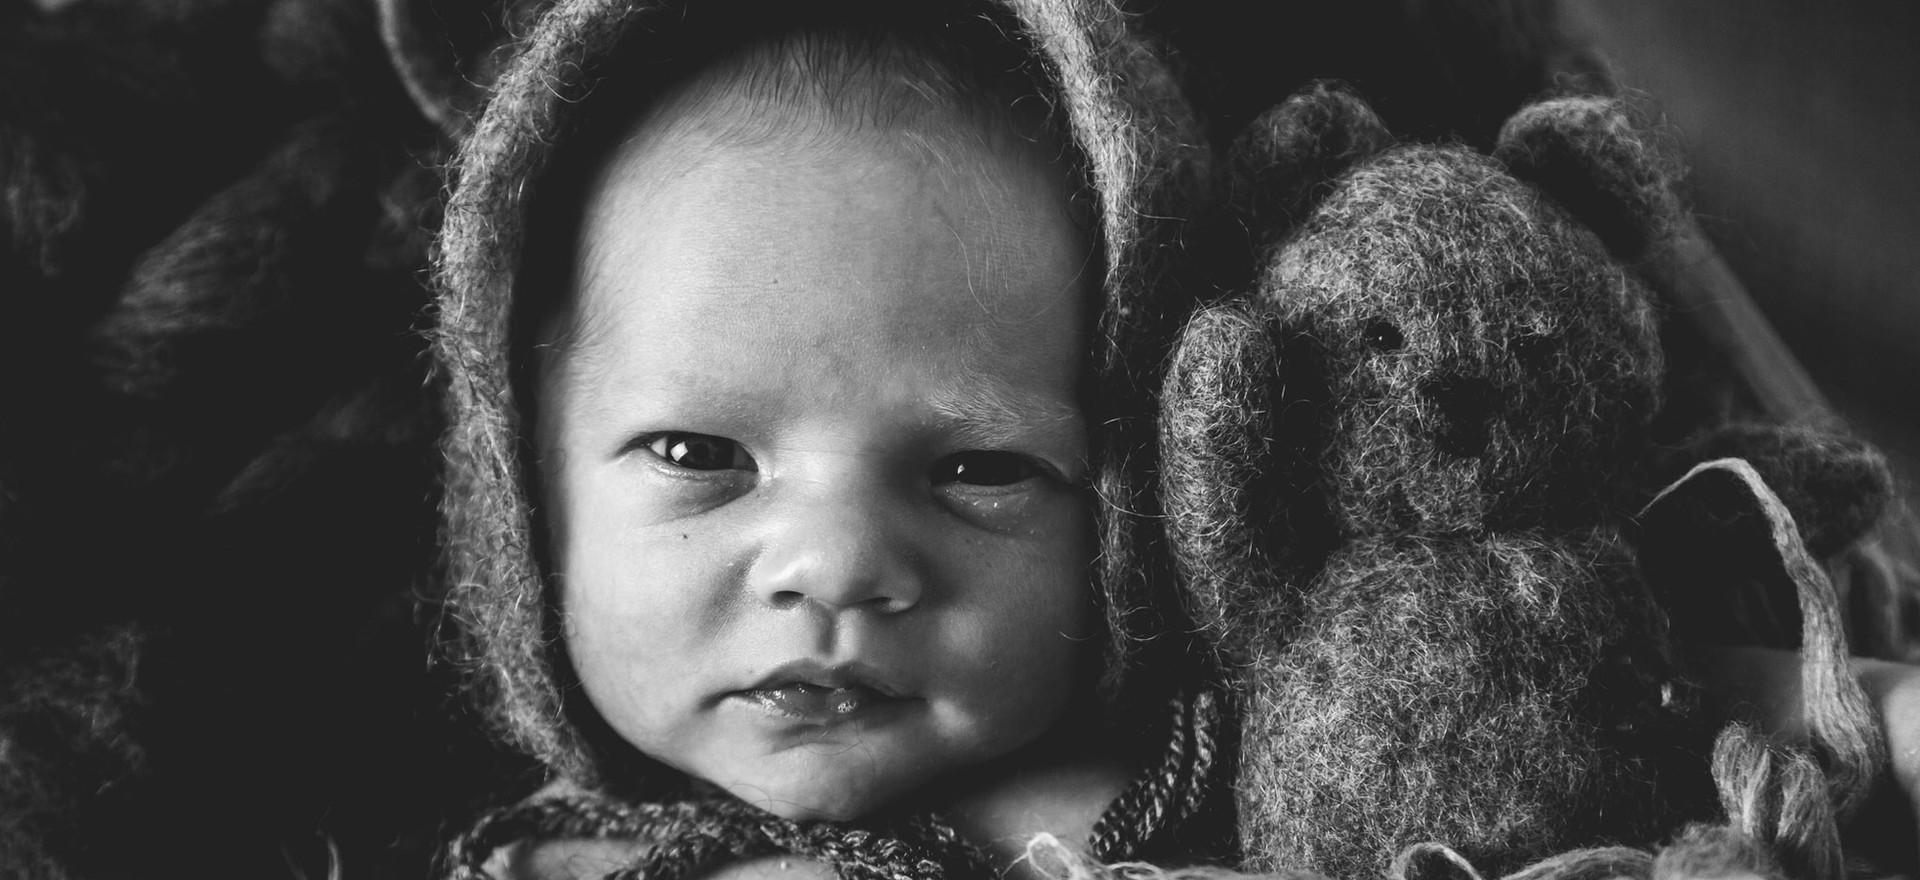 Spiegel Baby Fotografie-32.jpg